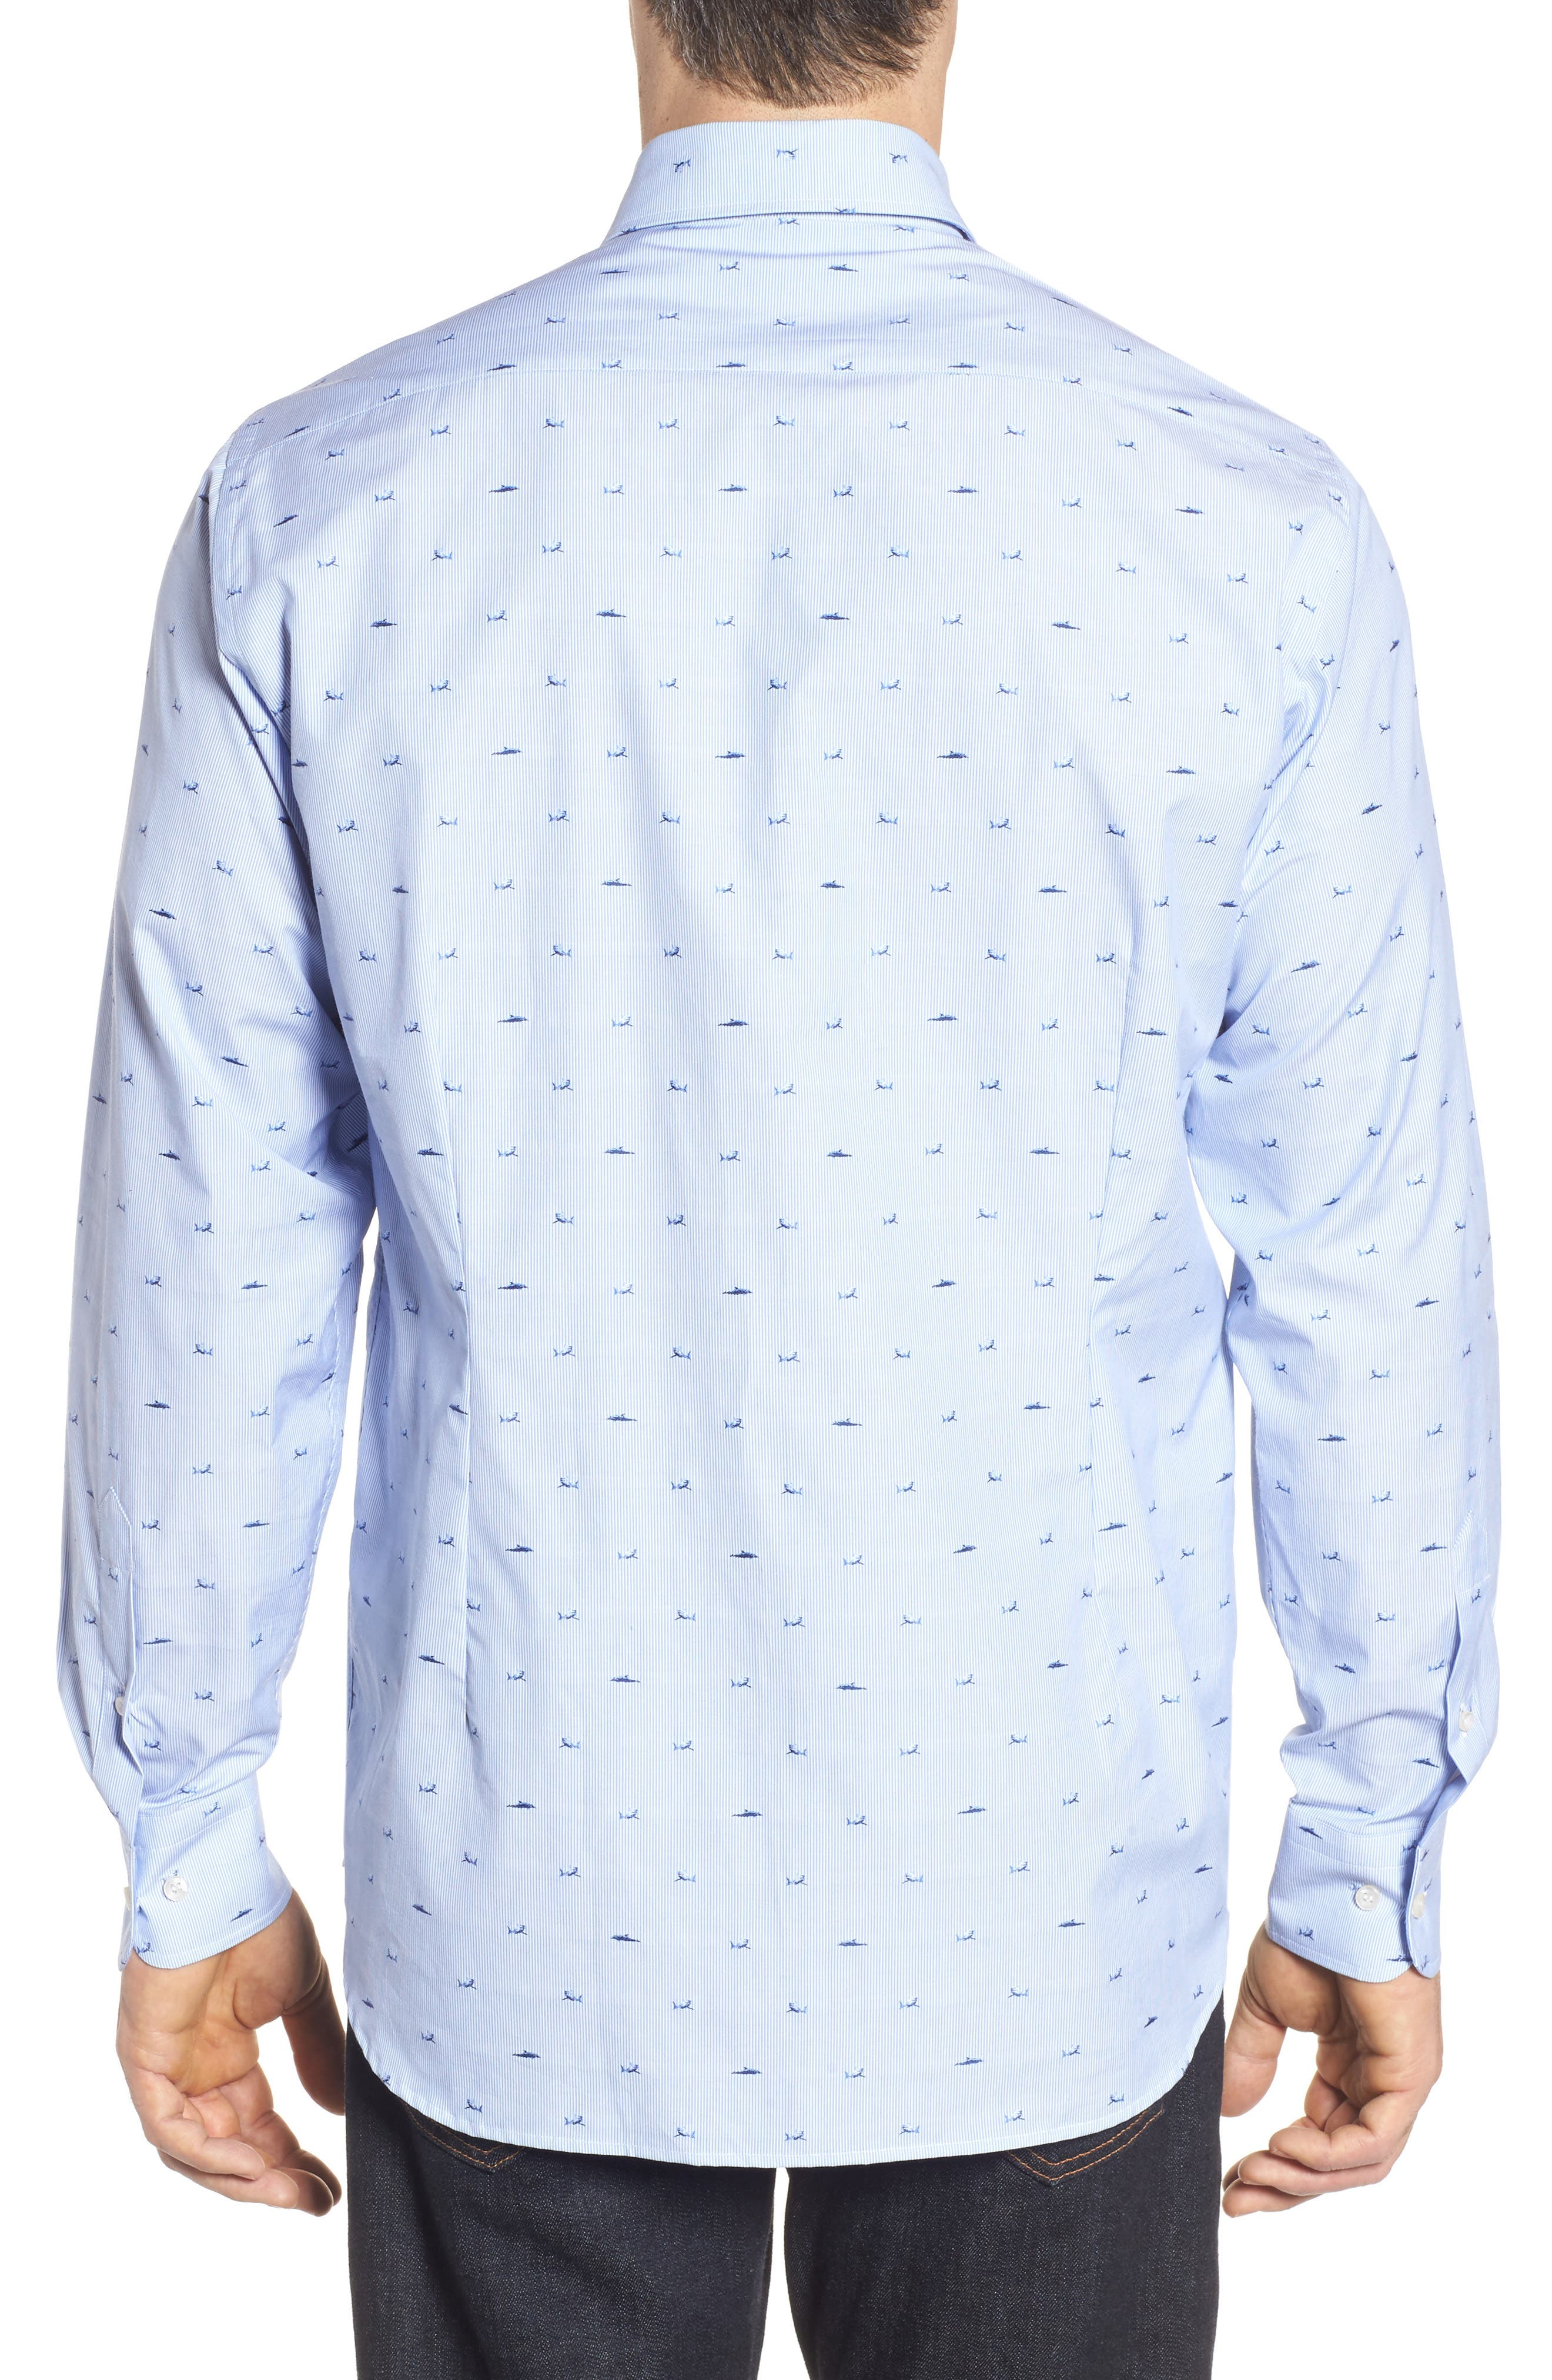 Paul&Shark Great White Jacquard Sport Shirt,                             Alternate thumbnail 2, color,